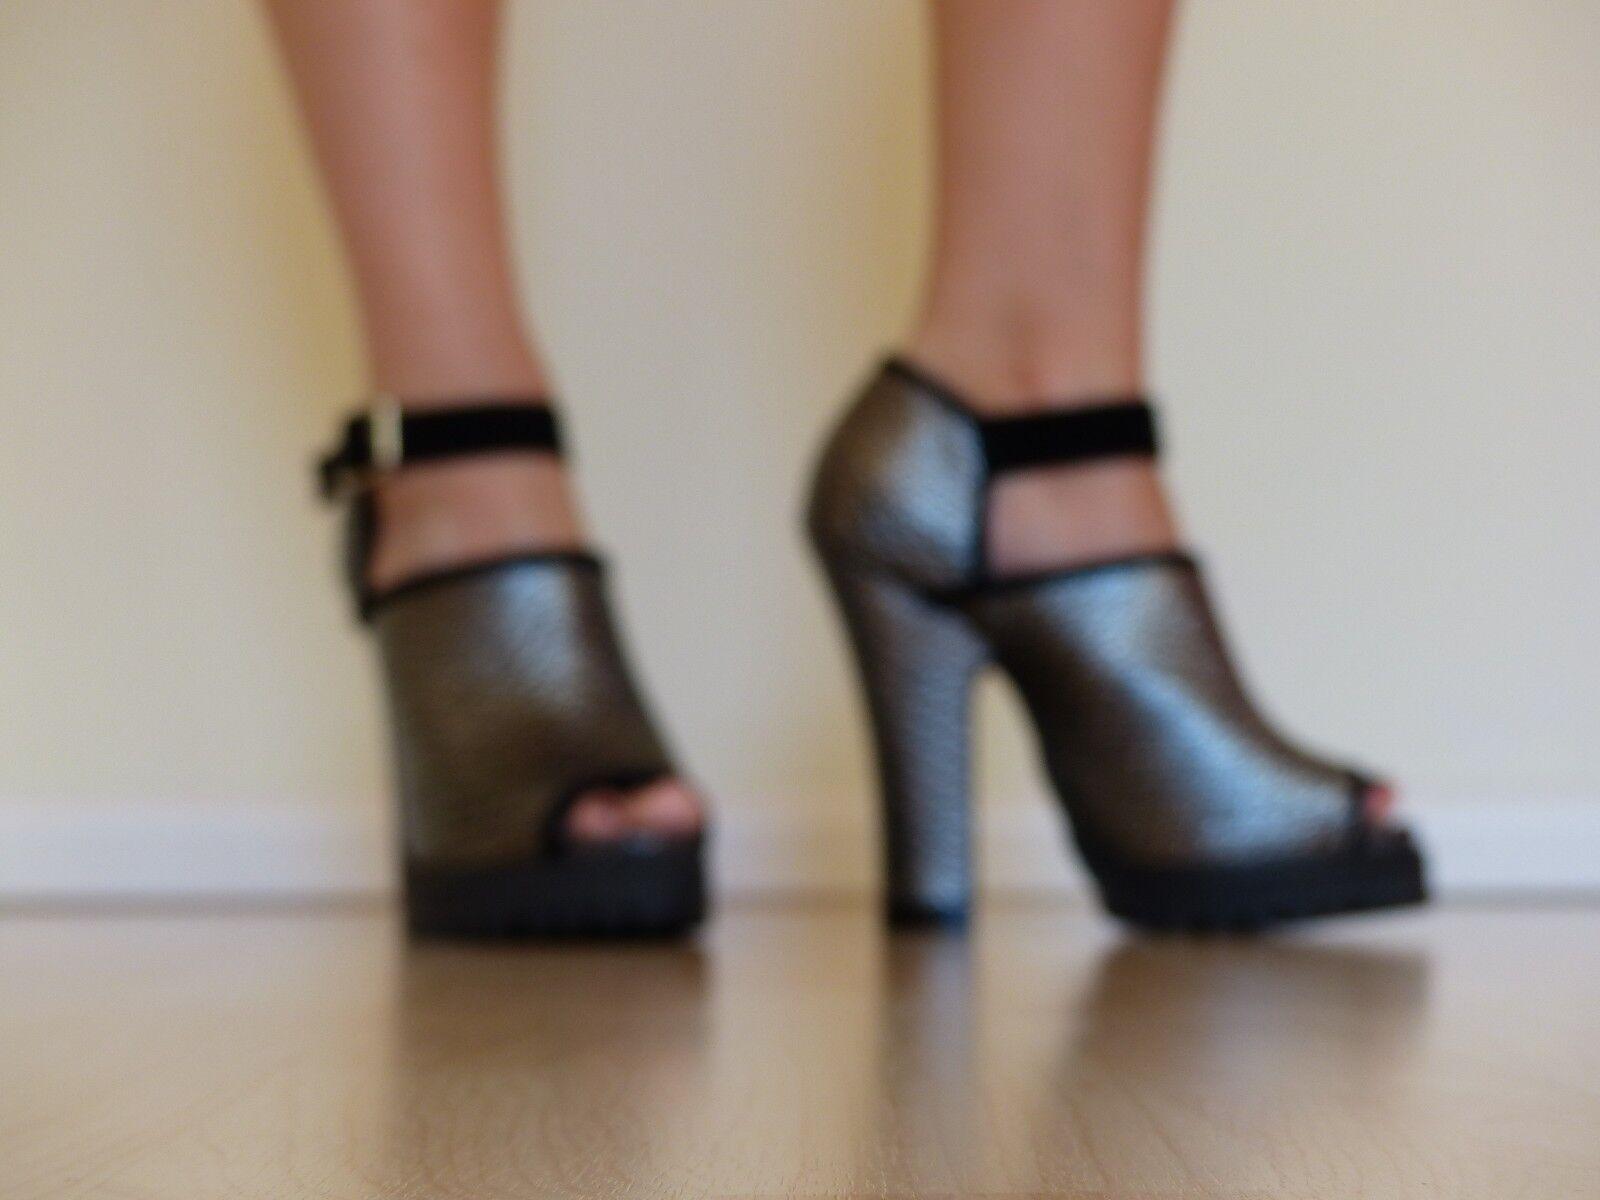 Shellys London Acywen Leder Peep Toe Heels Pumps Leder Acywen Gr. 38,5 schwarz silber NEU bf93db